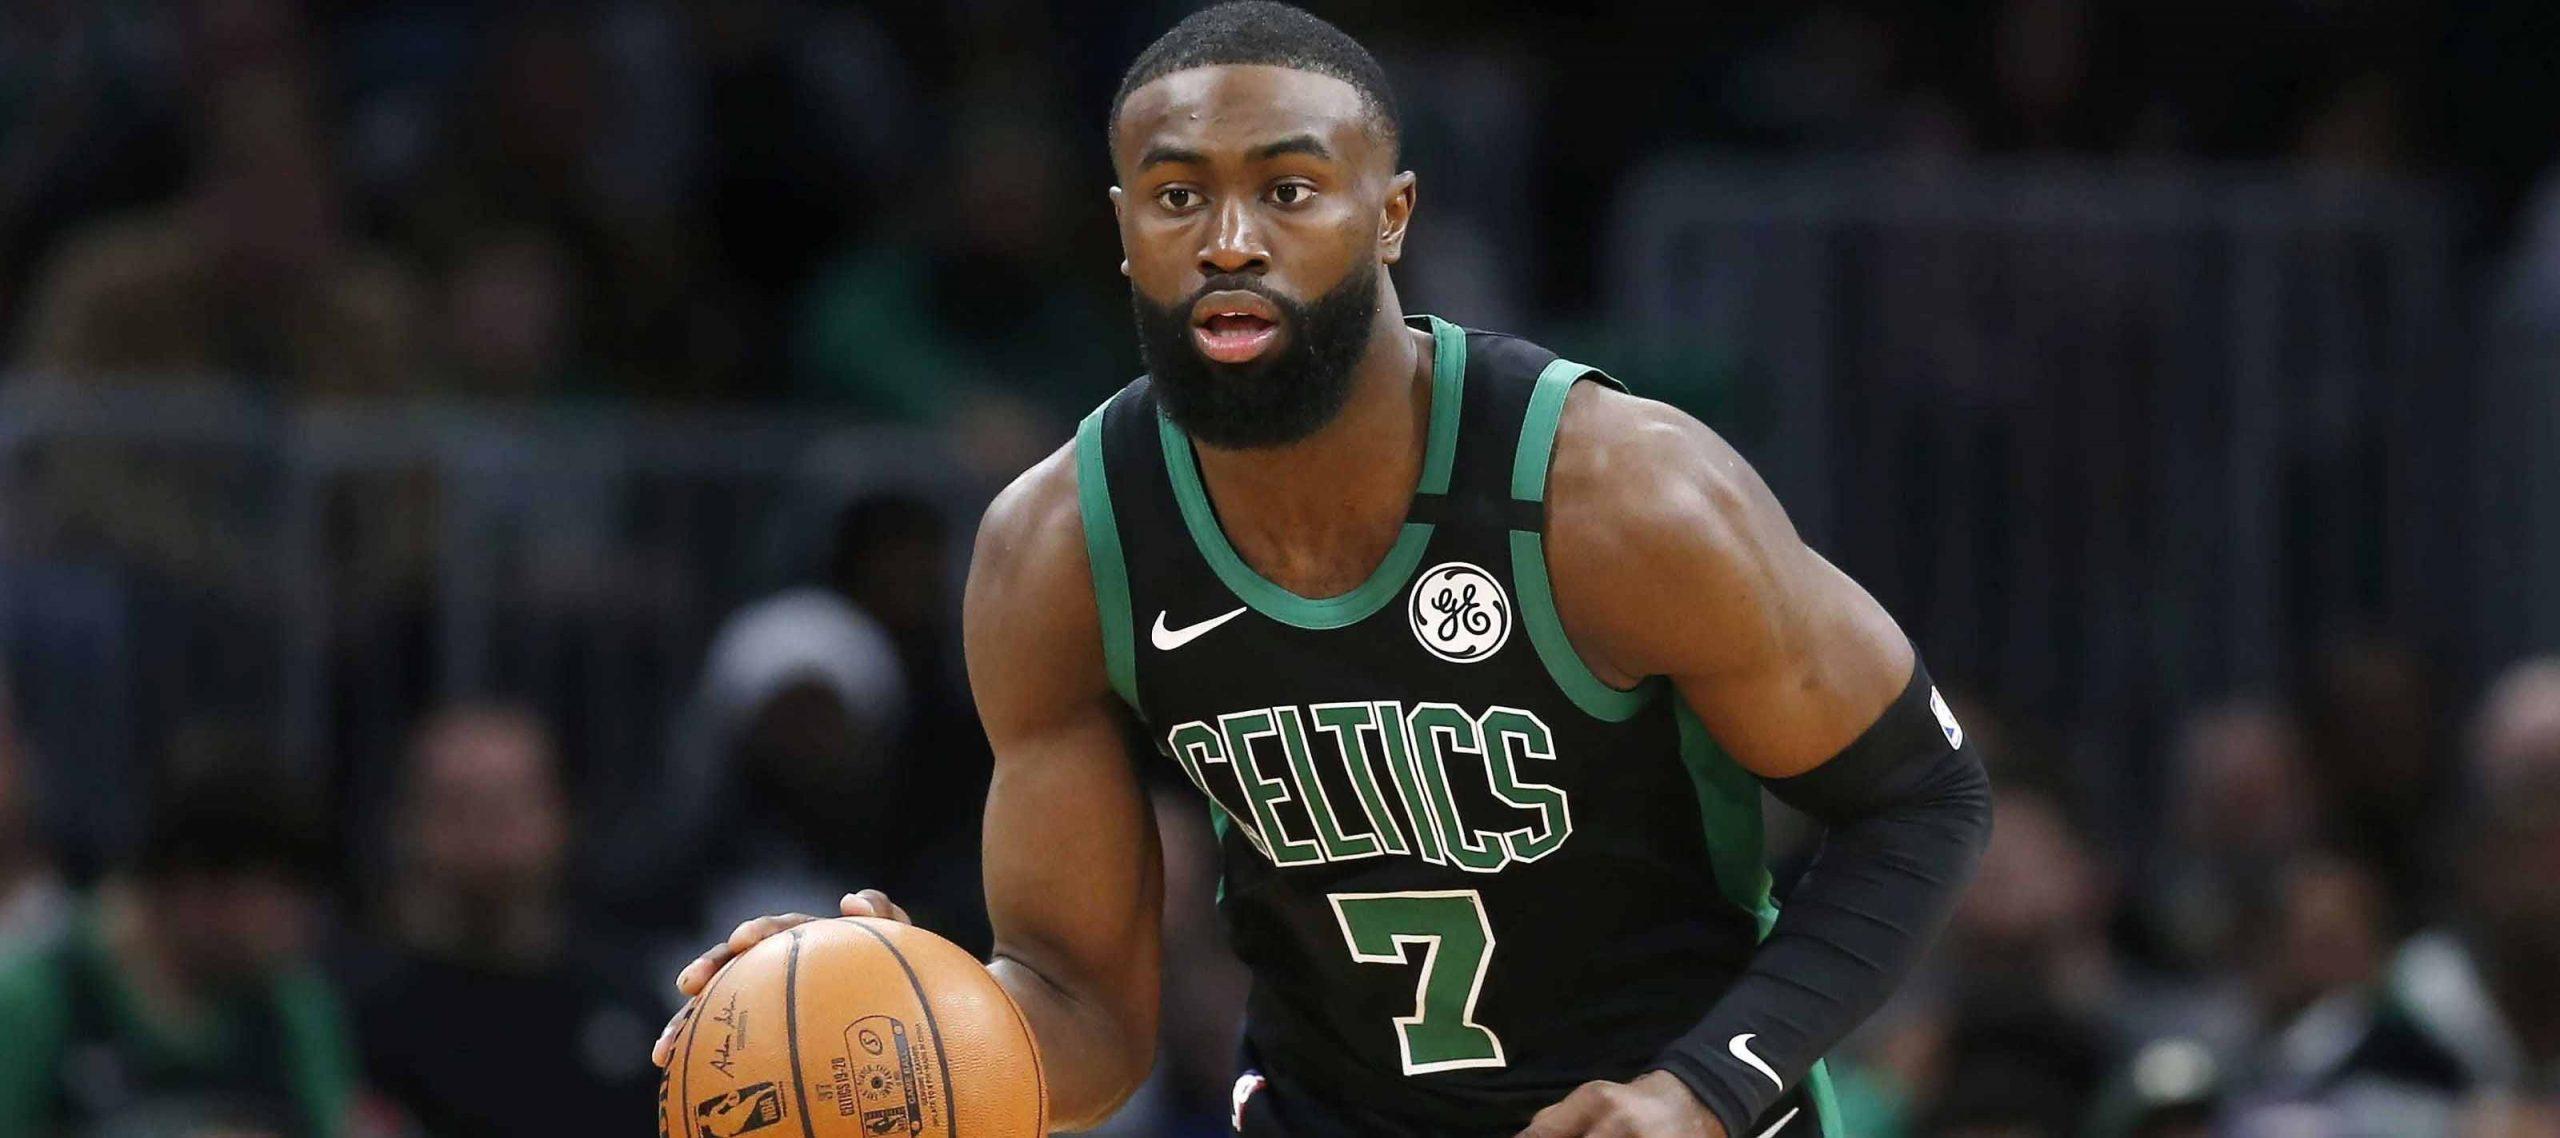 Celtics vs Nets, Game 5